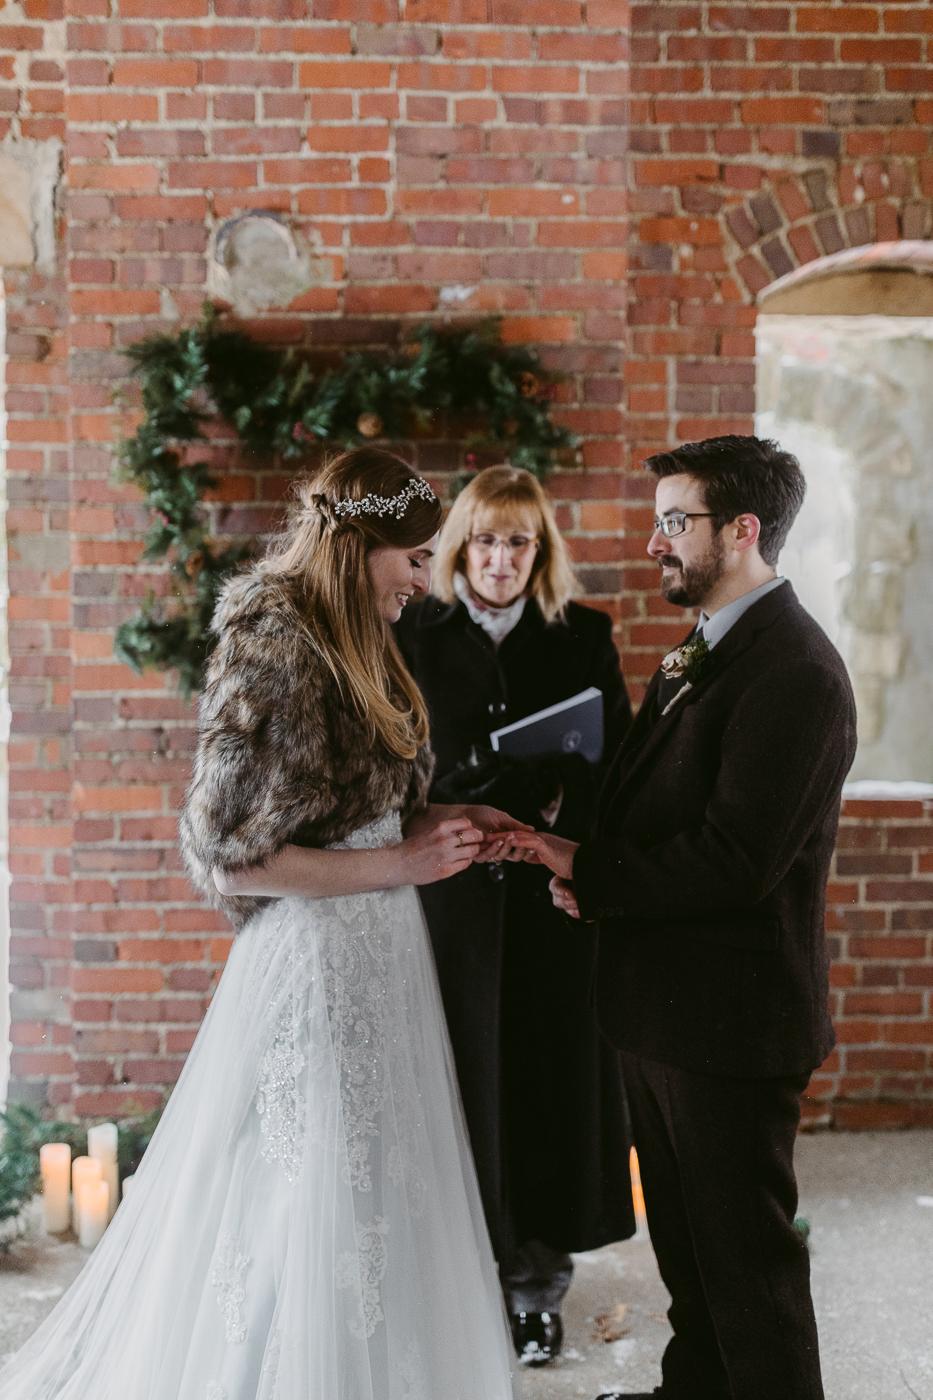 Squires-Castle-Winter-Wedding-34.jpg